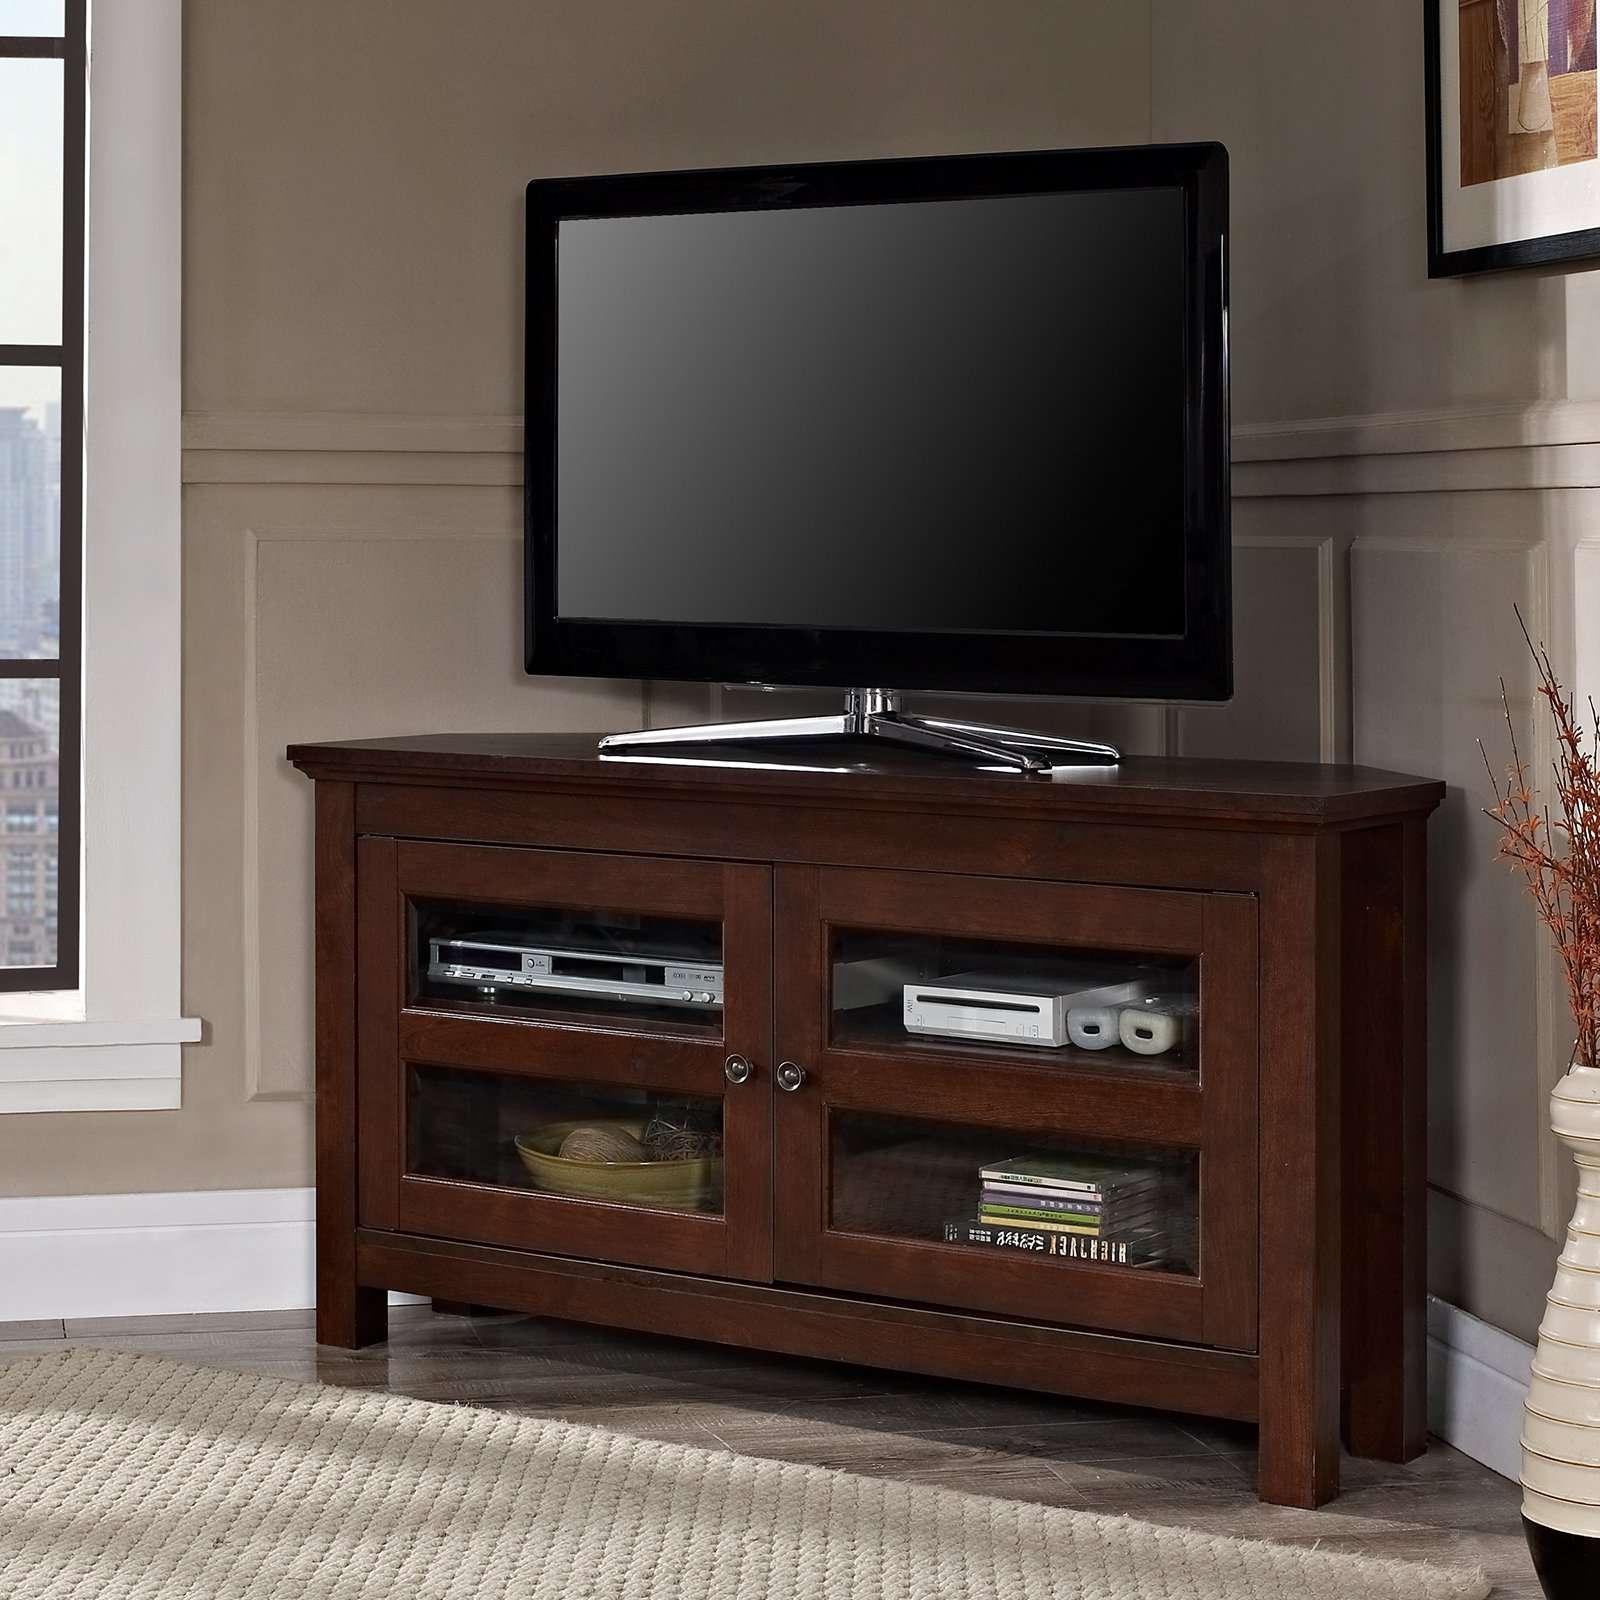 Compton Black Corner Tv Stand | Hayneedle Regarding Black Corner Tv Cabinets (View 7 of 20)